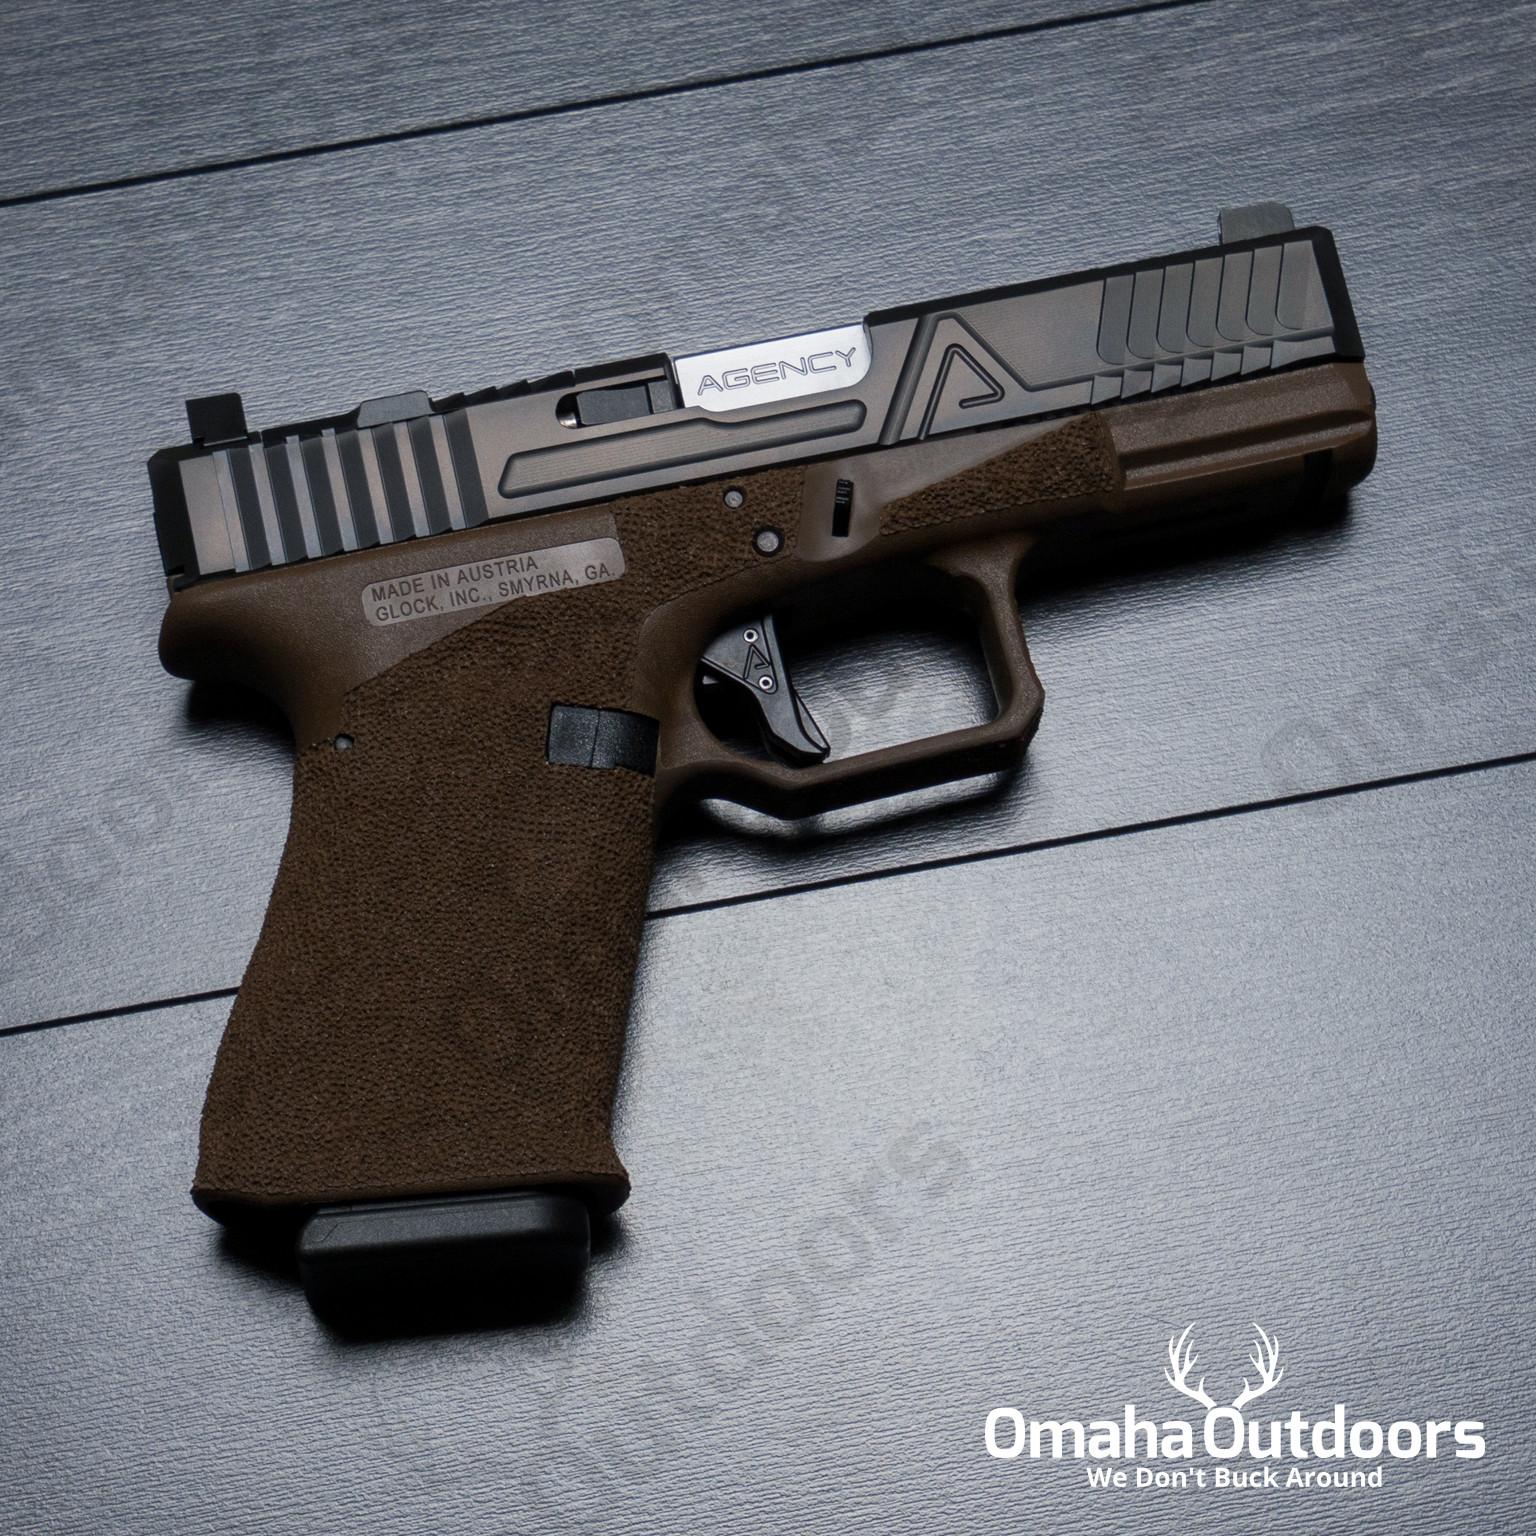 Agency Arms Glock 19 Gen 3 Hybrid FDE Pistol 9mm 15 RD Night Sights  AA-G19-G3-DE-HS